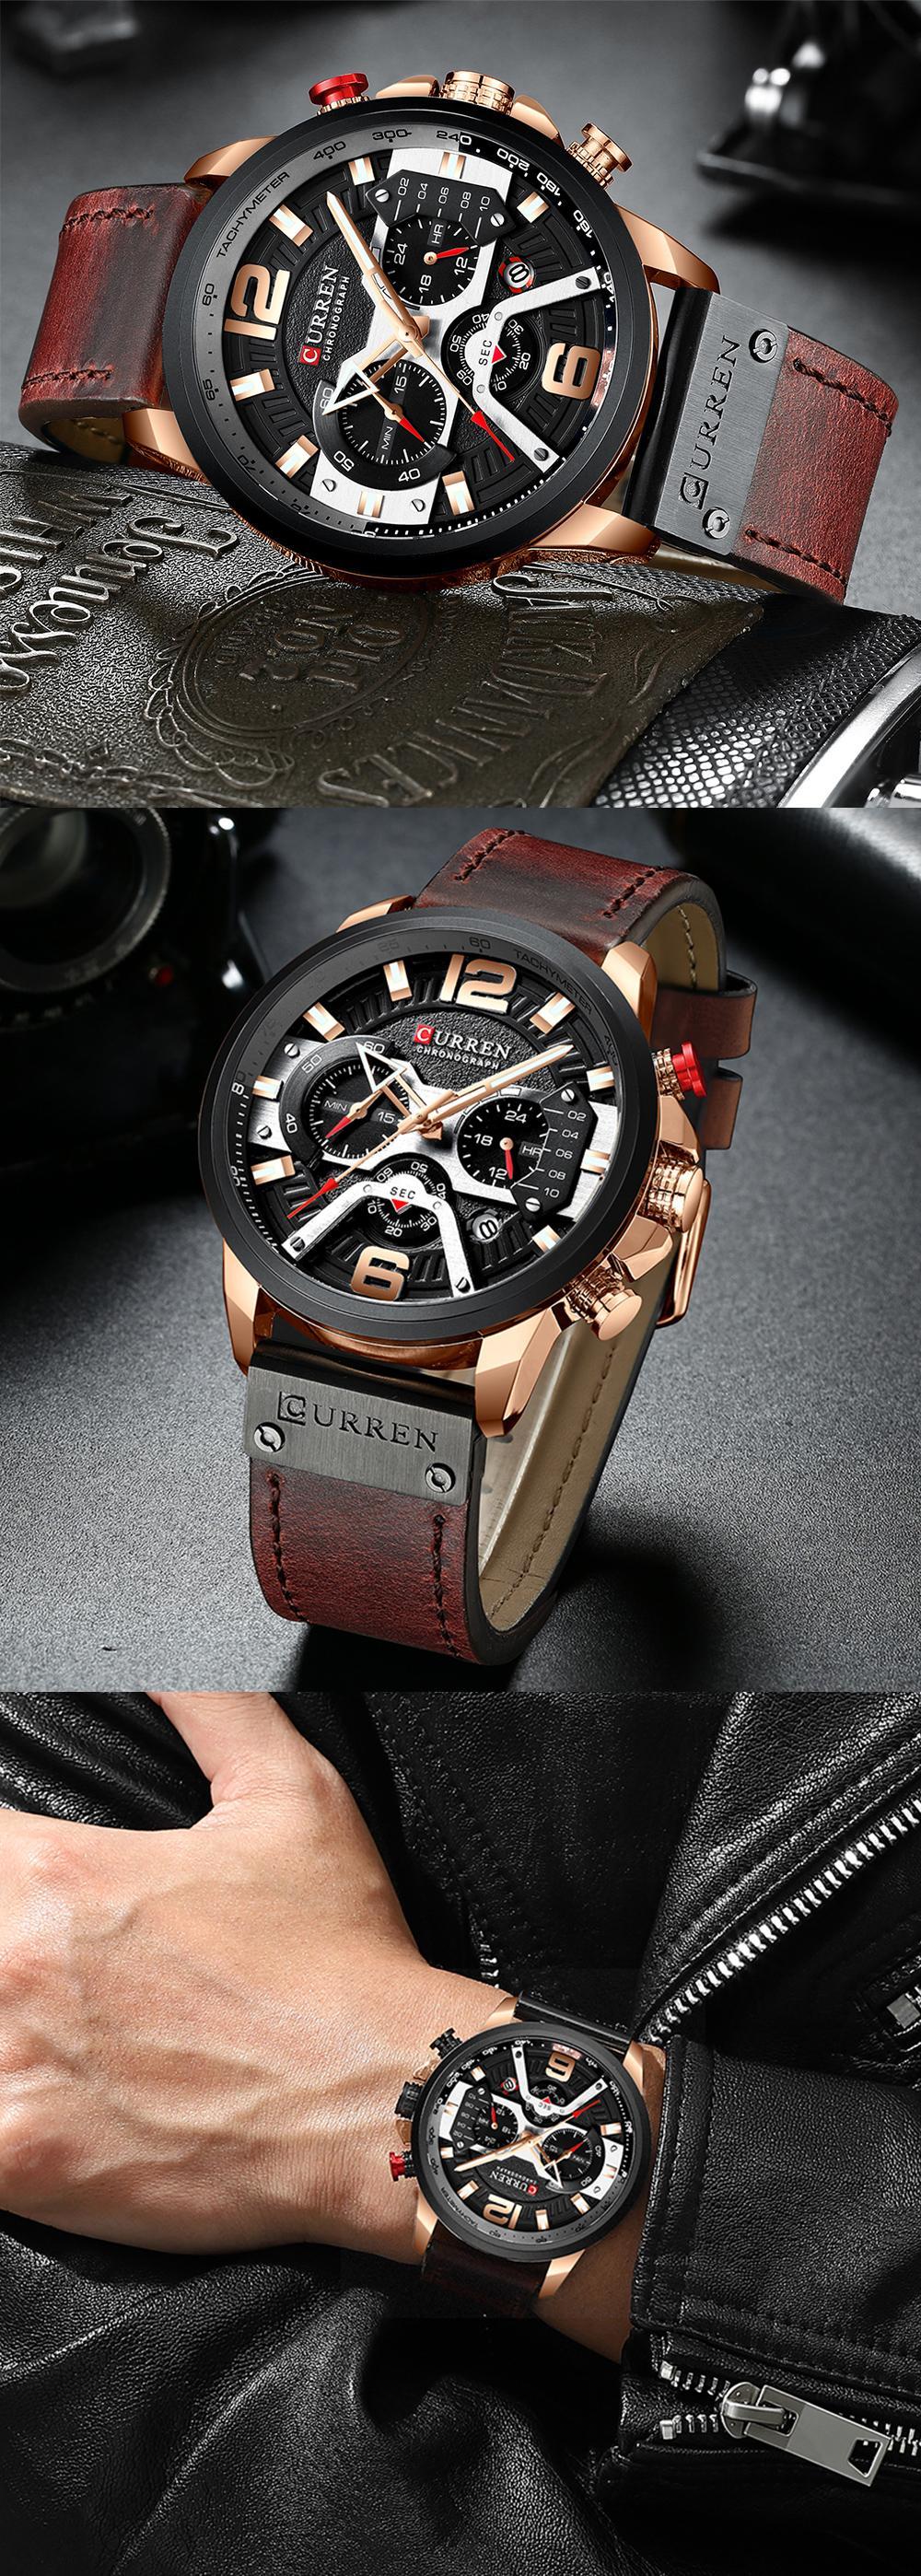 HTB1 Tv3LMHqK1RjSZFgq6y7JXXa4 CURREN Relogio Masculino Sport Watch Men Top Brand Luxury Quartz Men's Chronograph Date Military Wrist Watches Waterproof 8329